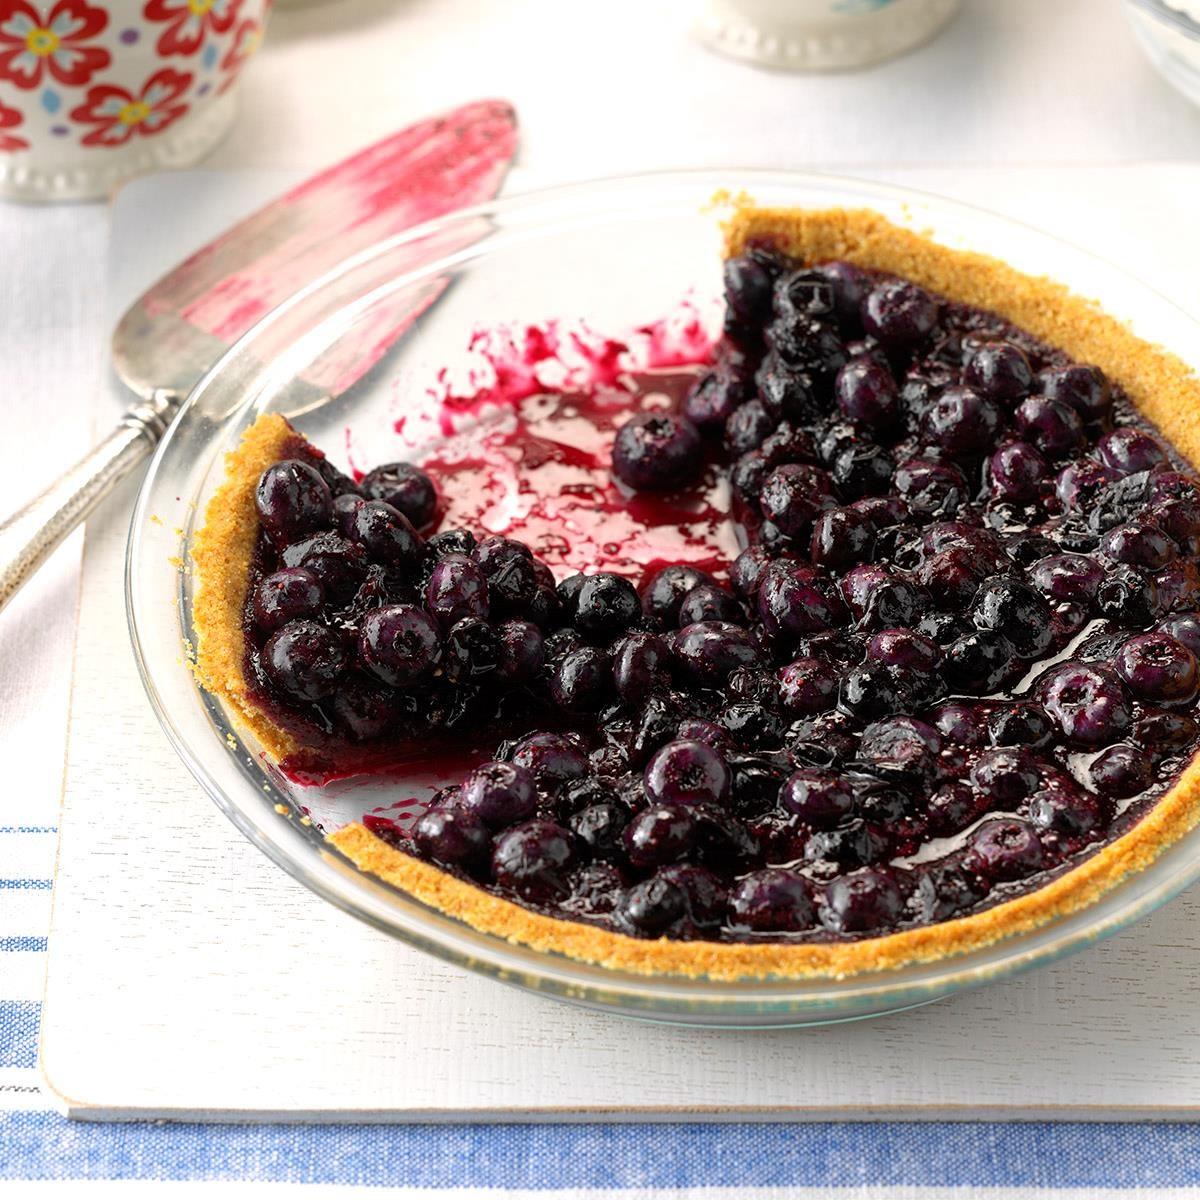 Blueberry Pie with Graham Cracker Crust